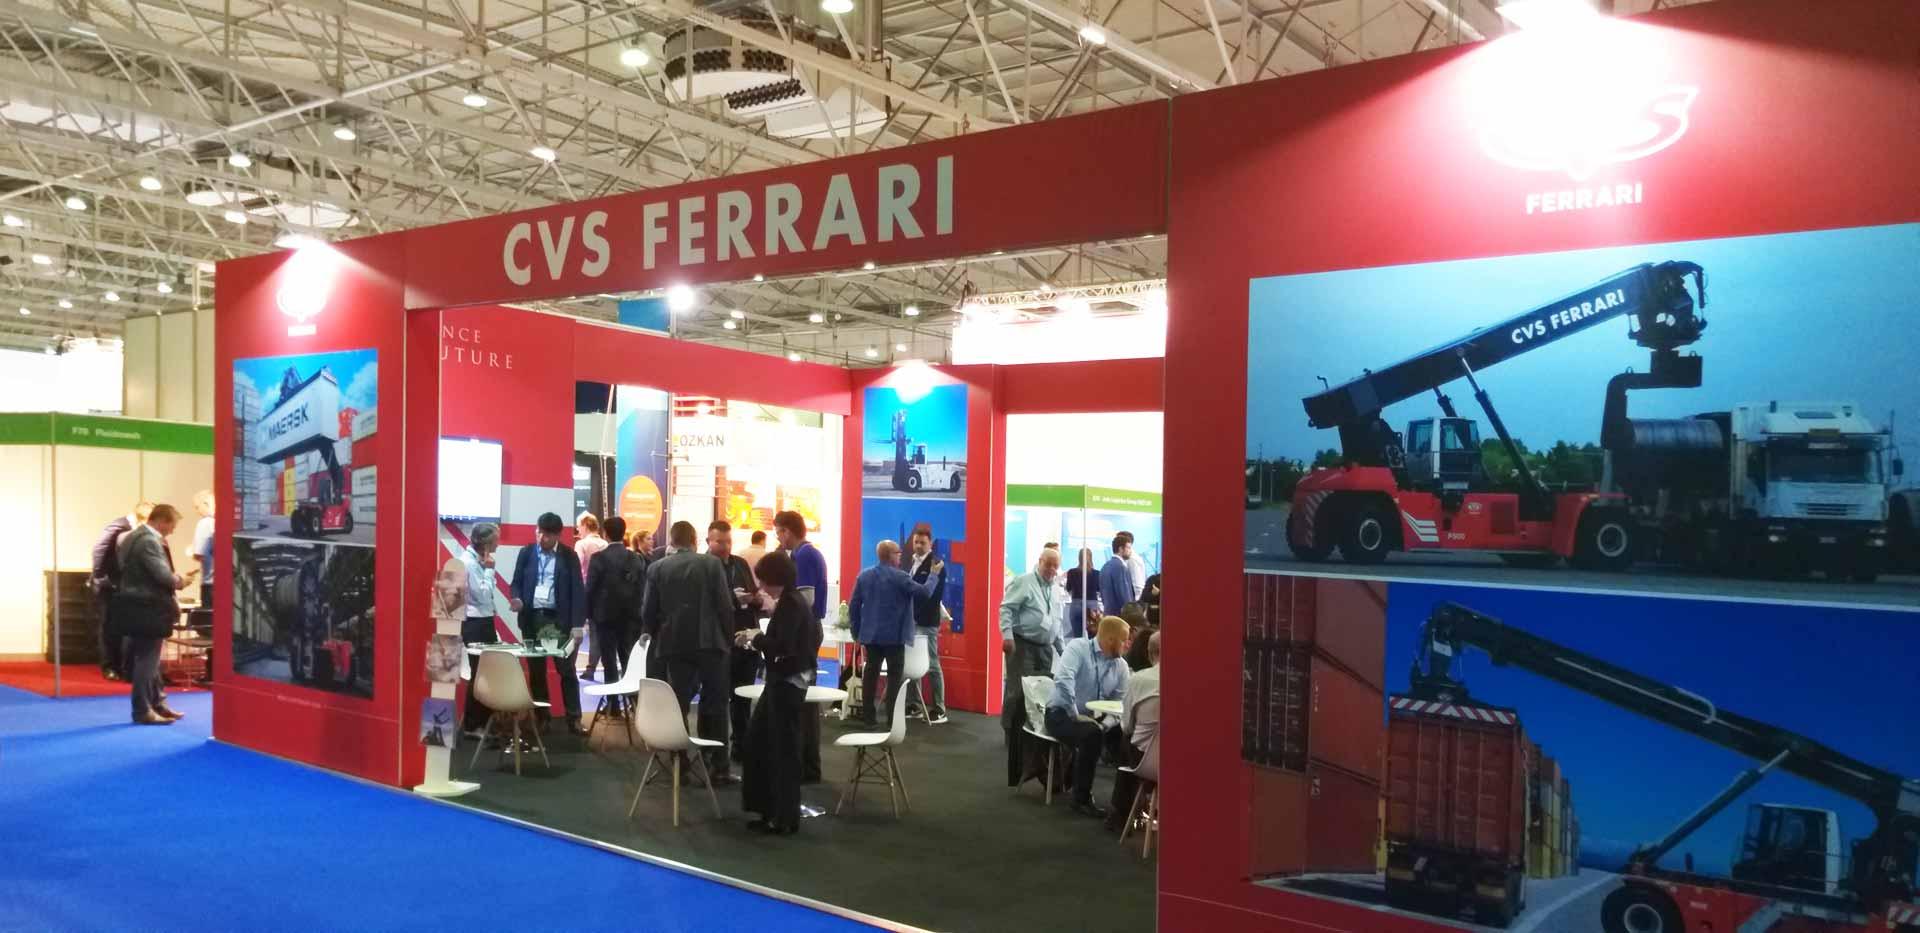 CVS ferrari - live from TOC europe 2019